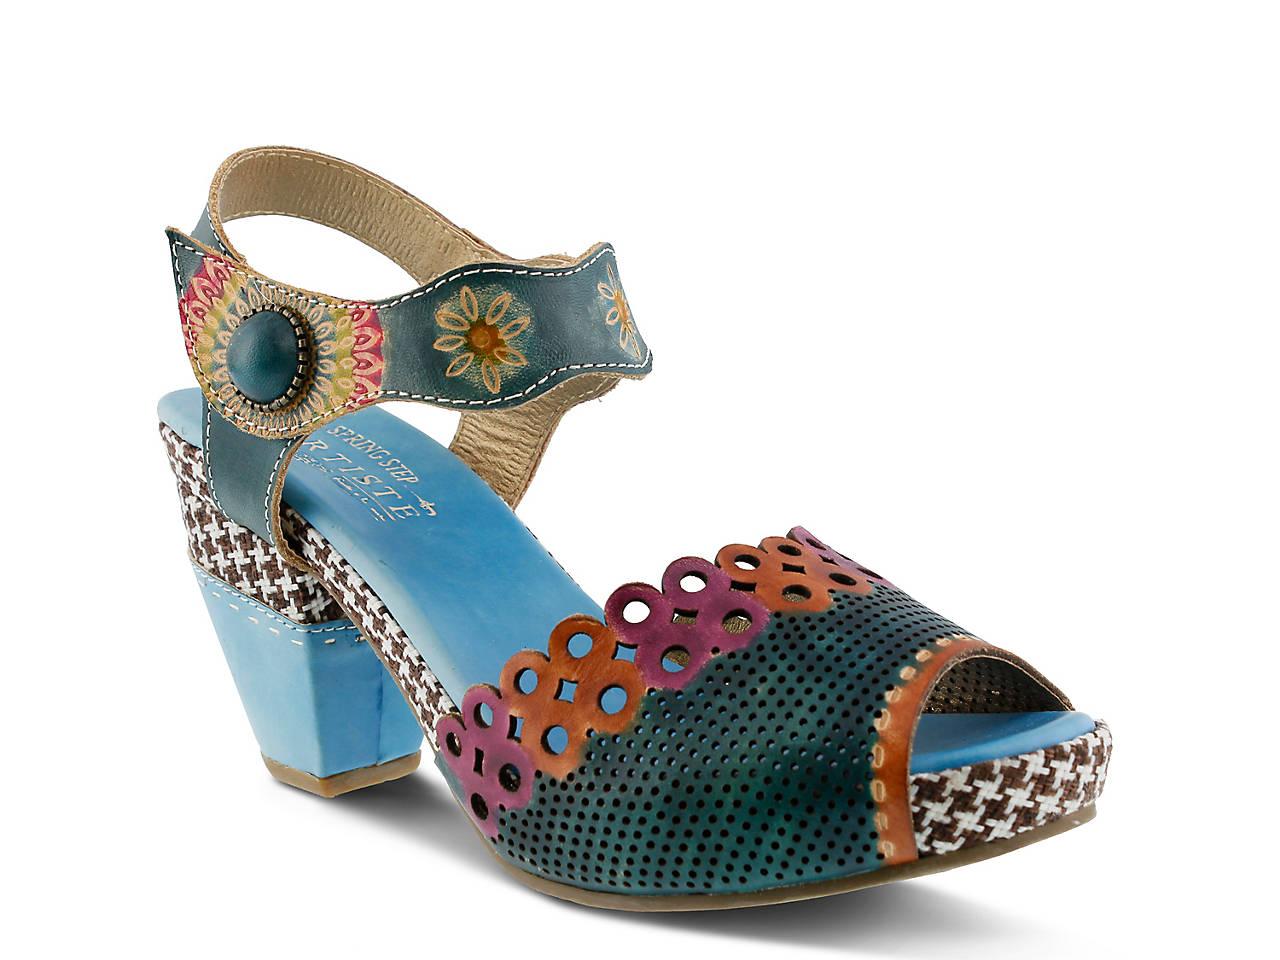 4cc6db7ea5 L'Artiste by Spring Step Jive Platform Sandal Women's Shoes | DSW